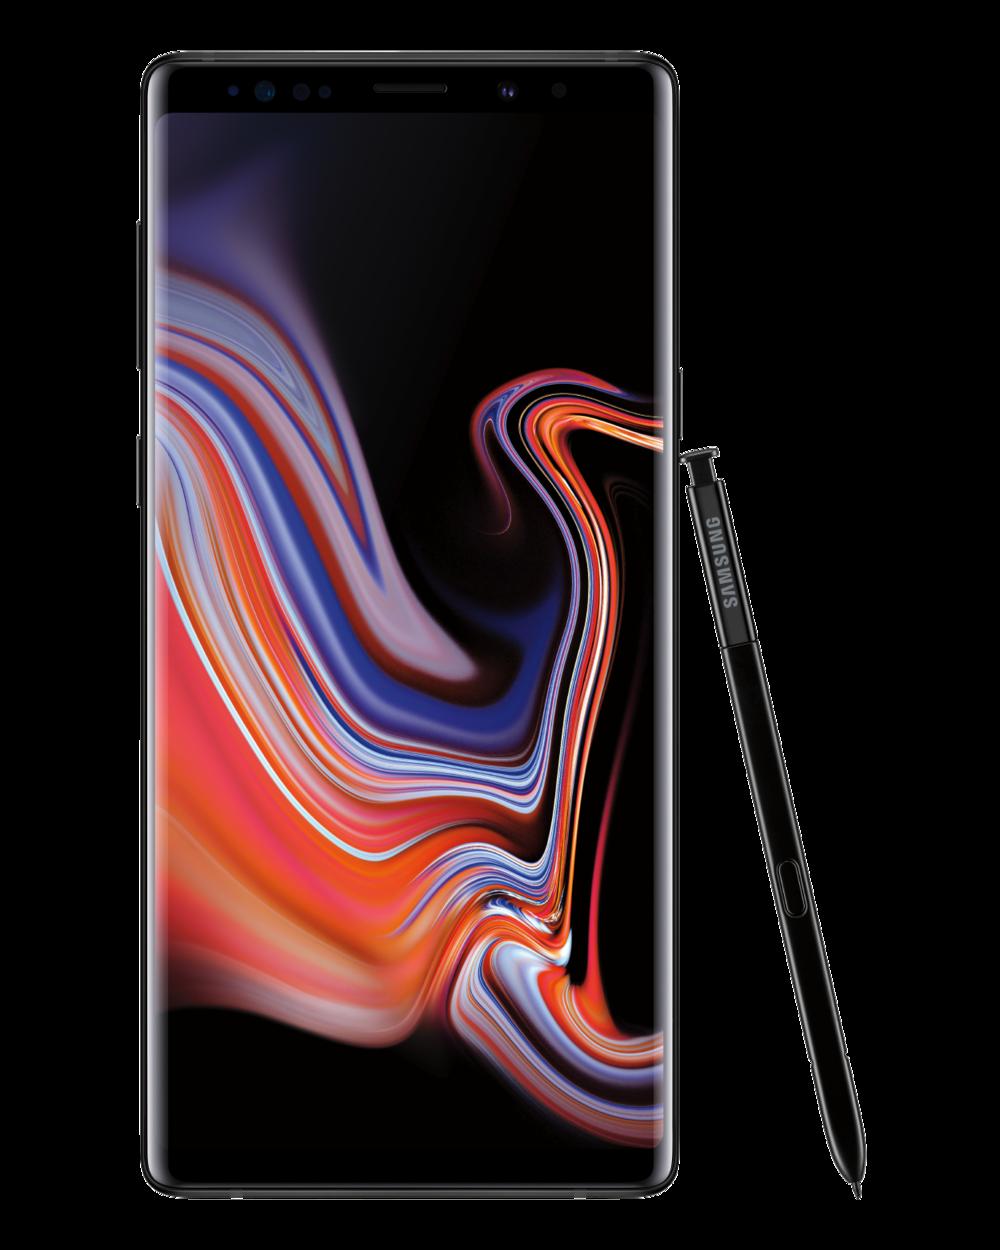 Galaxy Note9 black